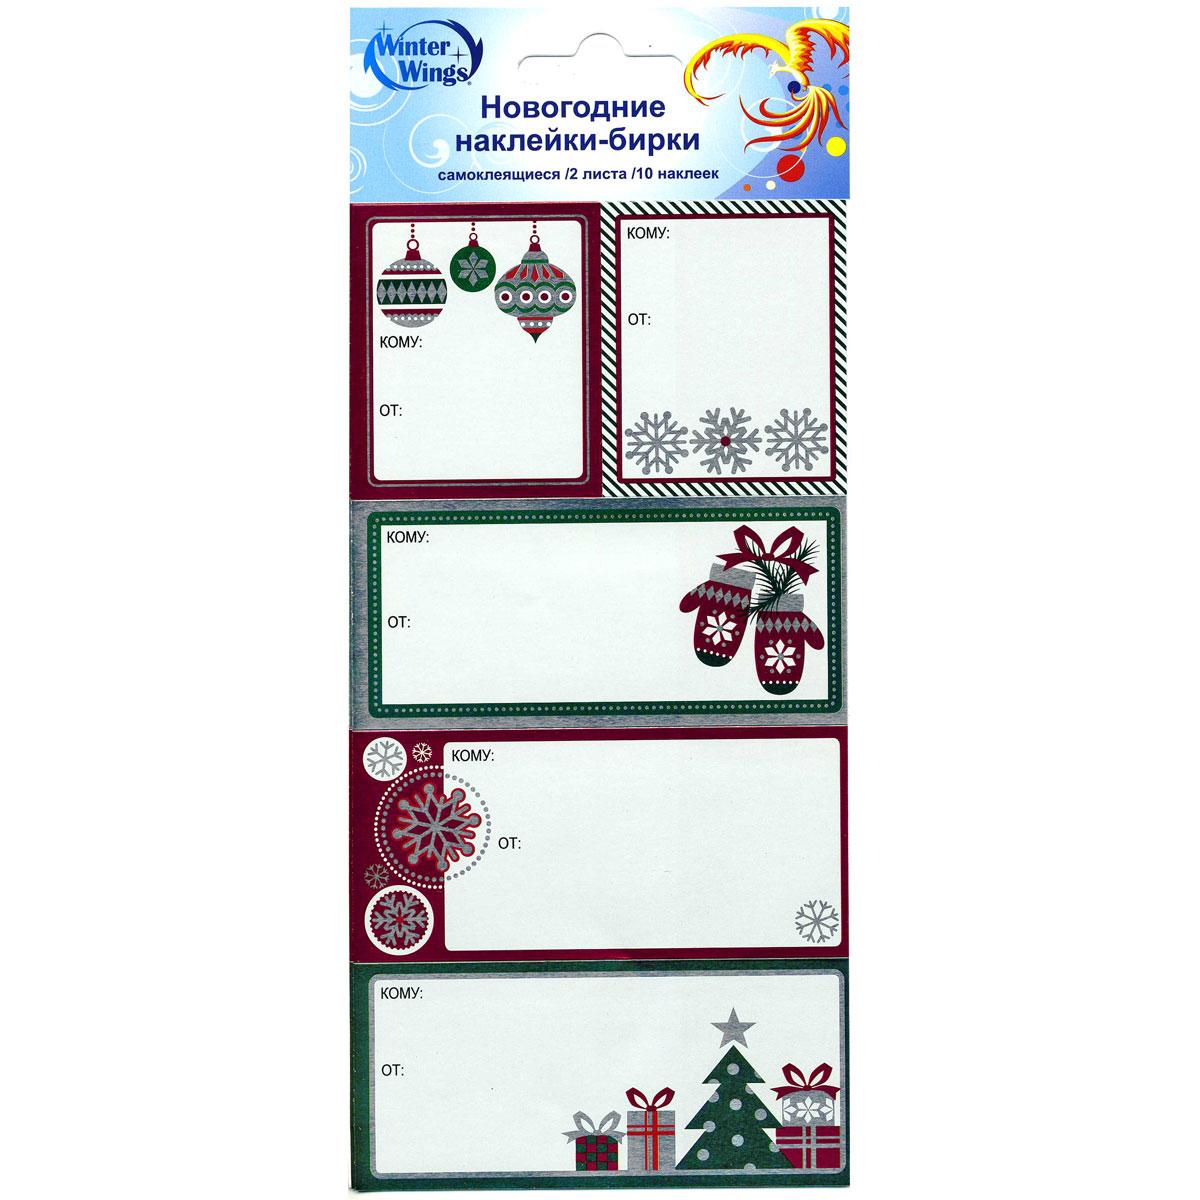 Набор наклеек для оформления подарков Winter Wings, 10 х 20 см, 2 листа. N09379N09379Набор наклеек для оформления подарков, 10*20 см, 2 листа, ПВХ